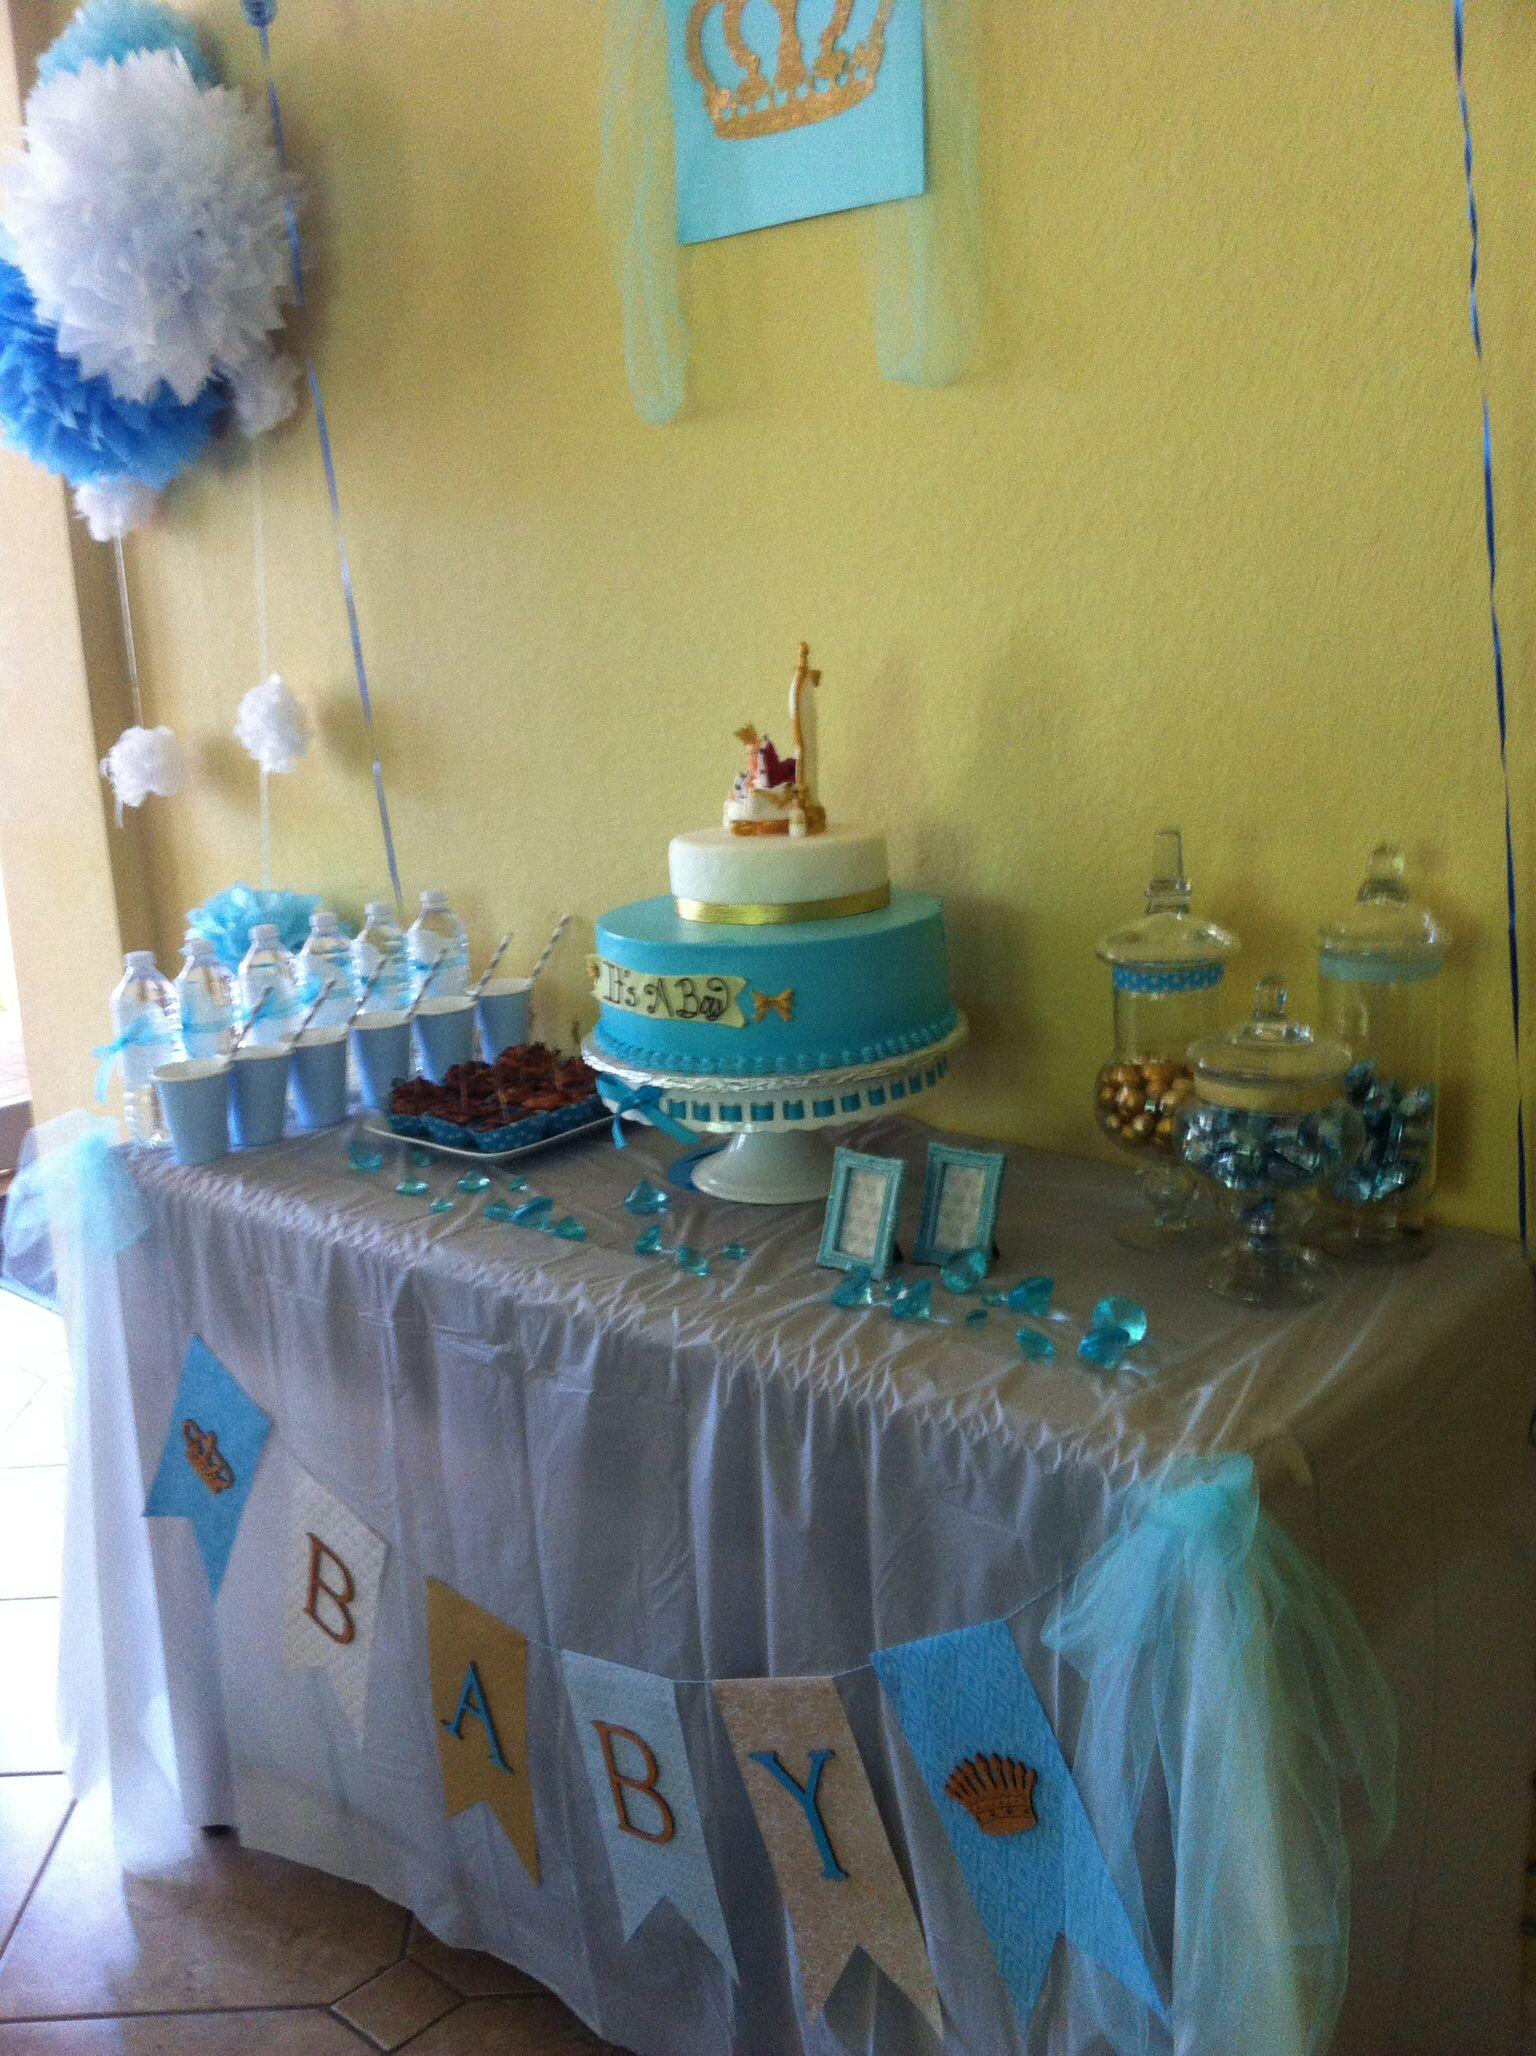 Cake decorating by kalinalina stefanova on my cake